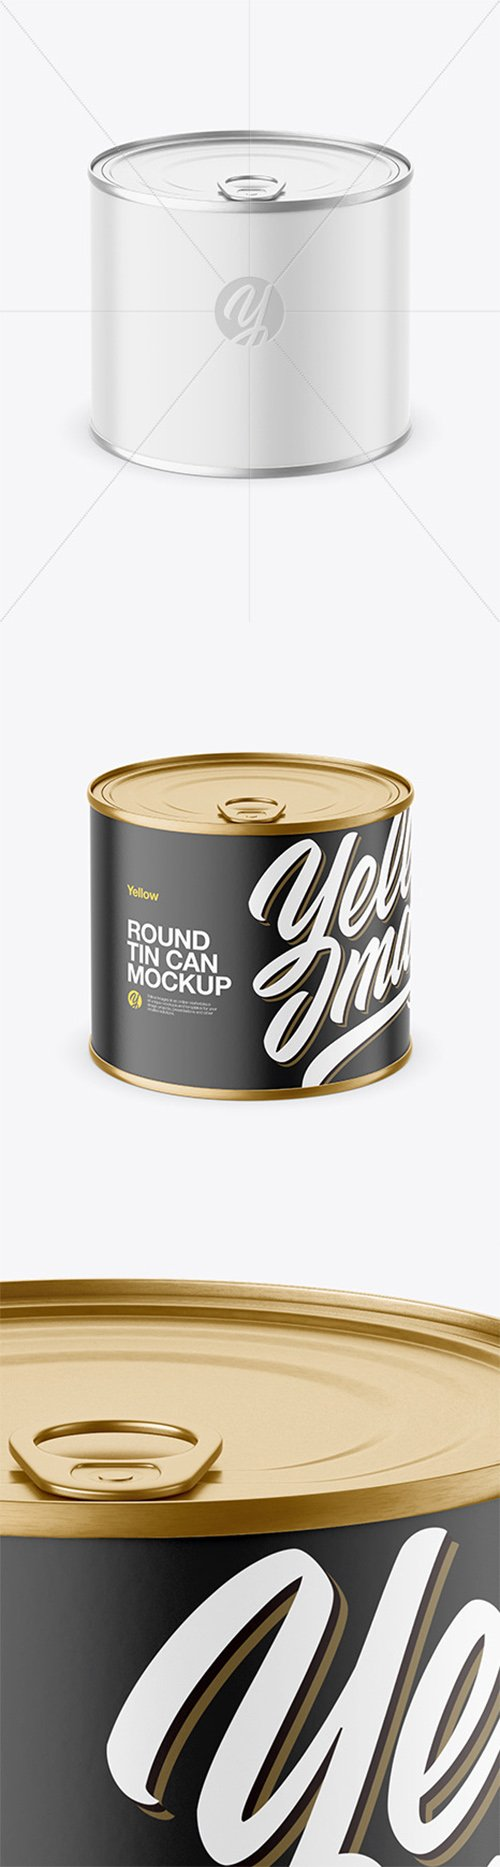 Round Tin Can Mockup 65617